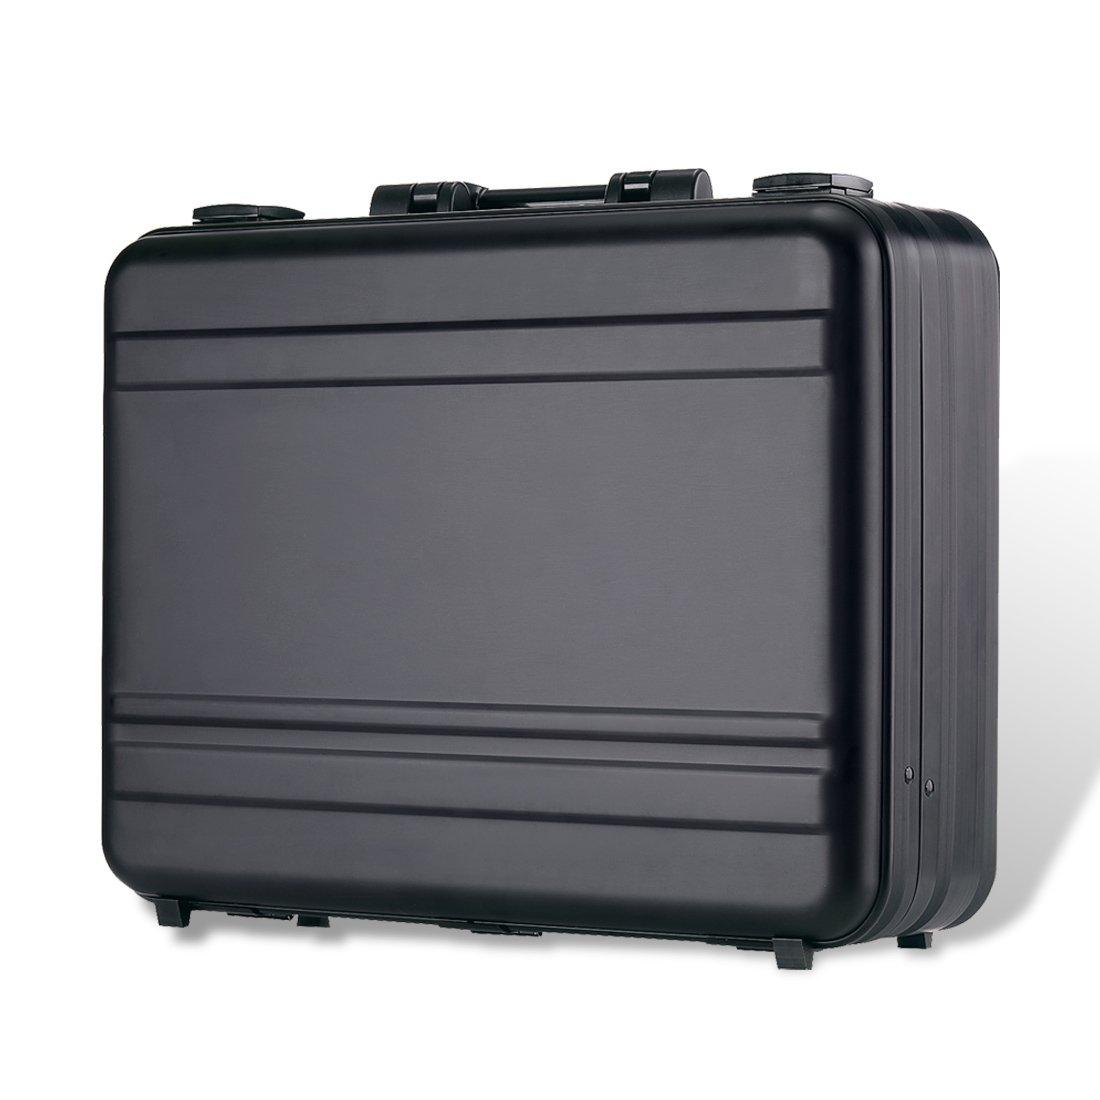 Aluminum Briefcase Large laptop case attache cases, TSA Customs Lock Custom space sponge shockproof Instrument, metal briefcase (black, 18.1X13.8X6.1 inch)